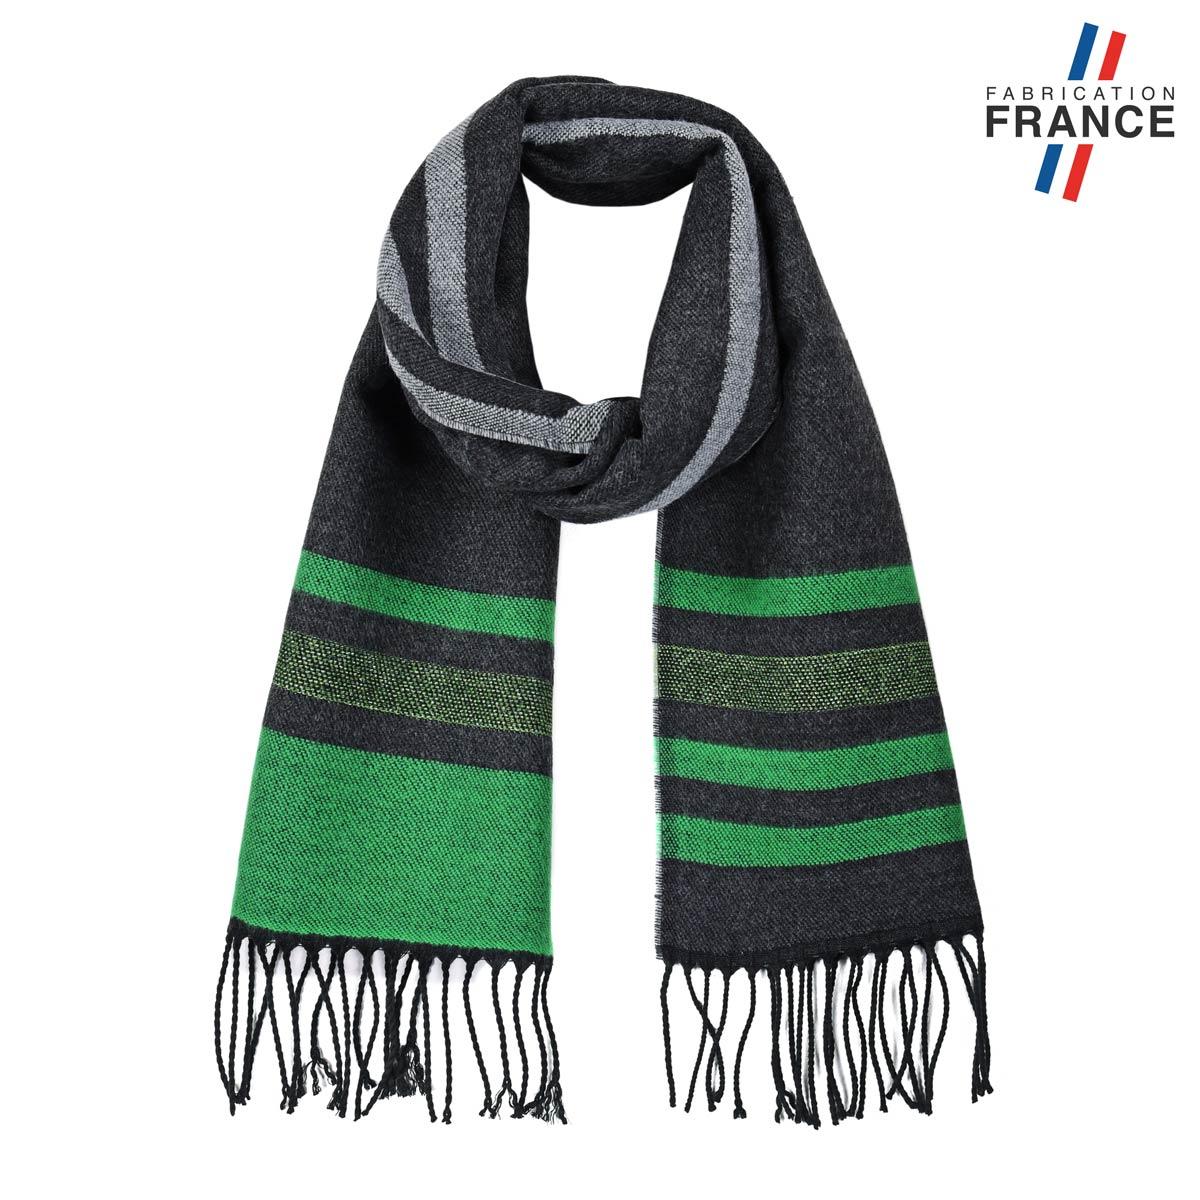 AT-05785_F12-1FR_Echarpe-rayures-vert-noir